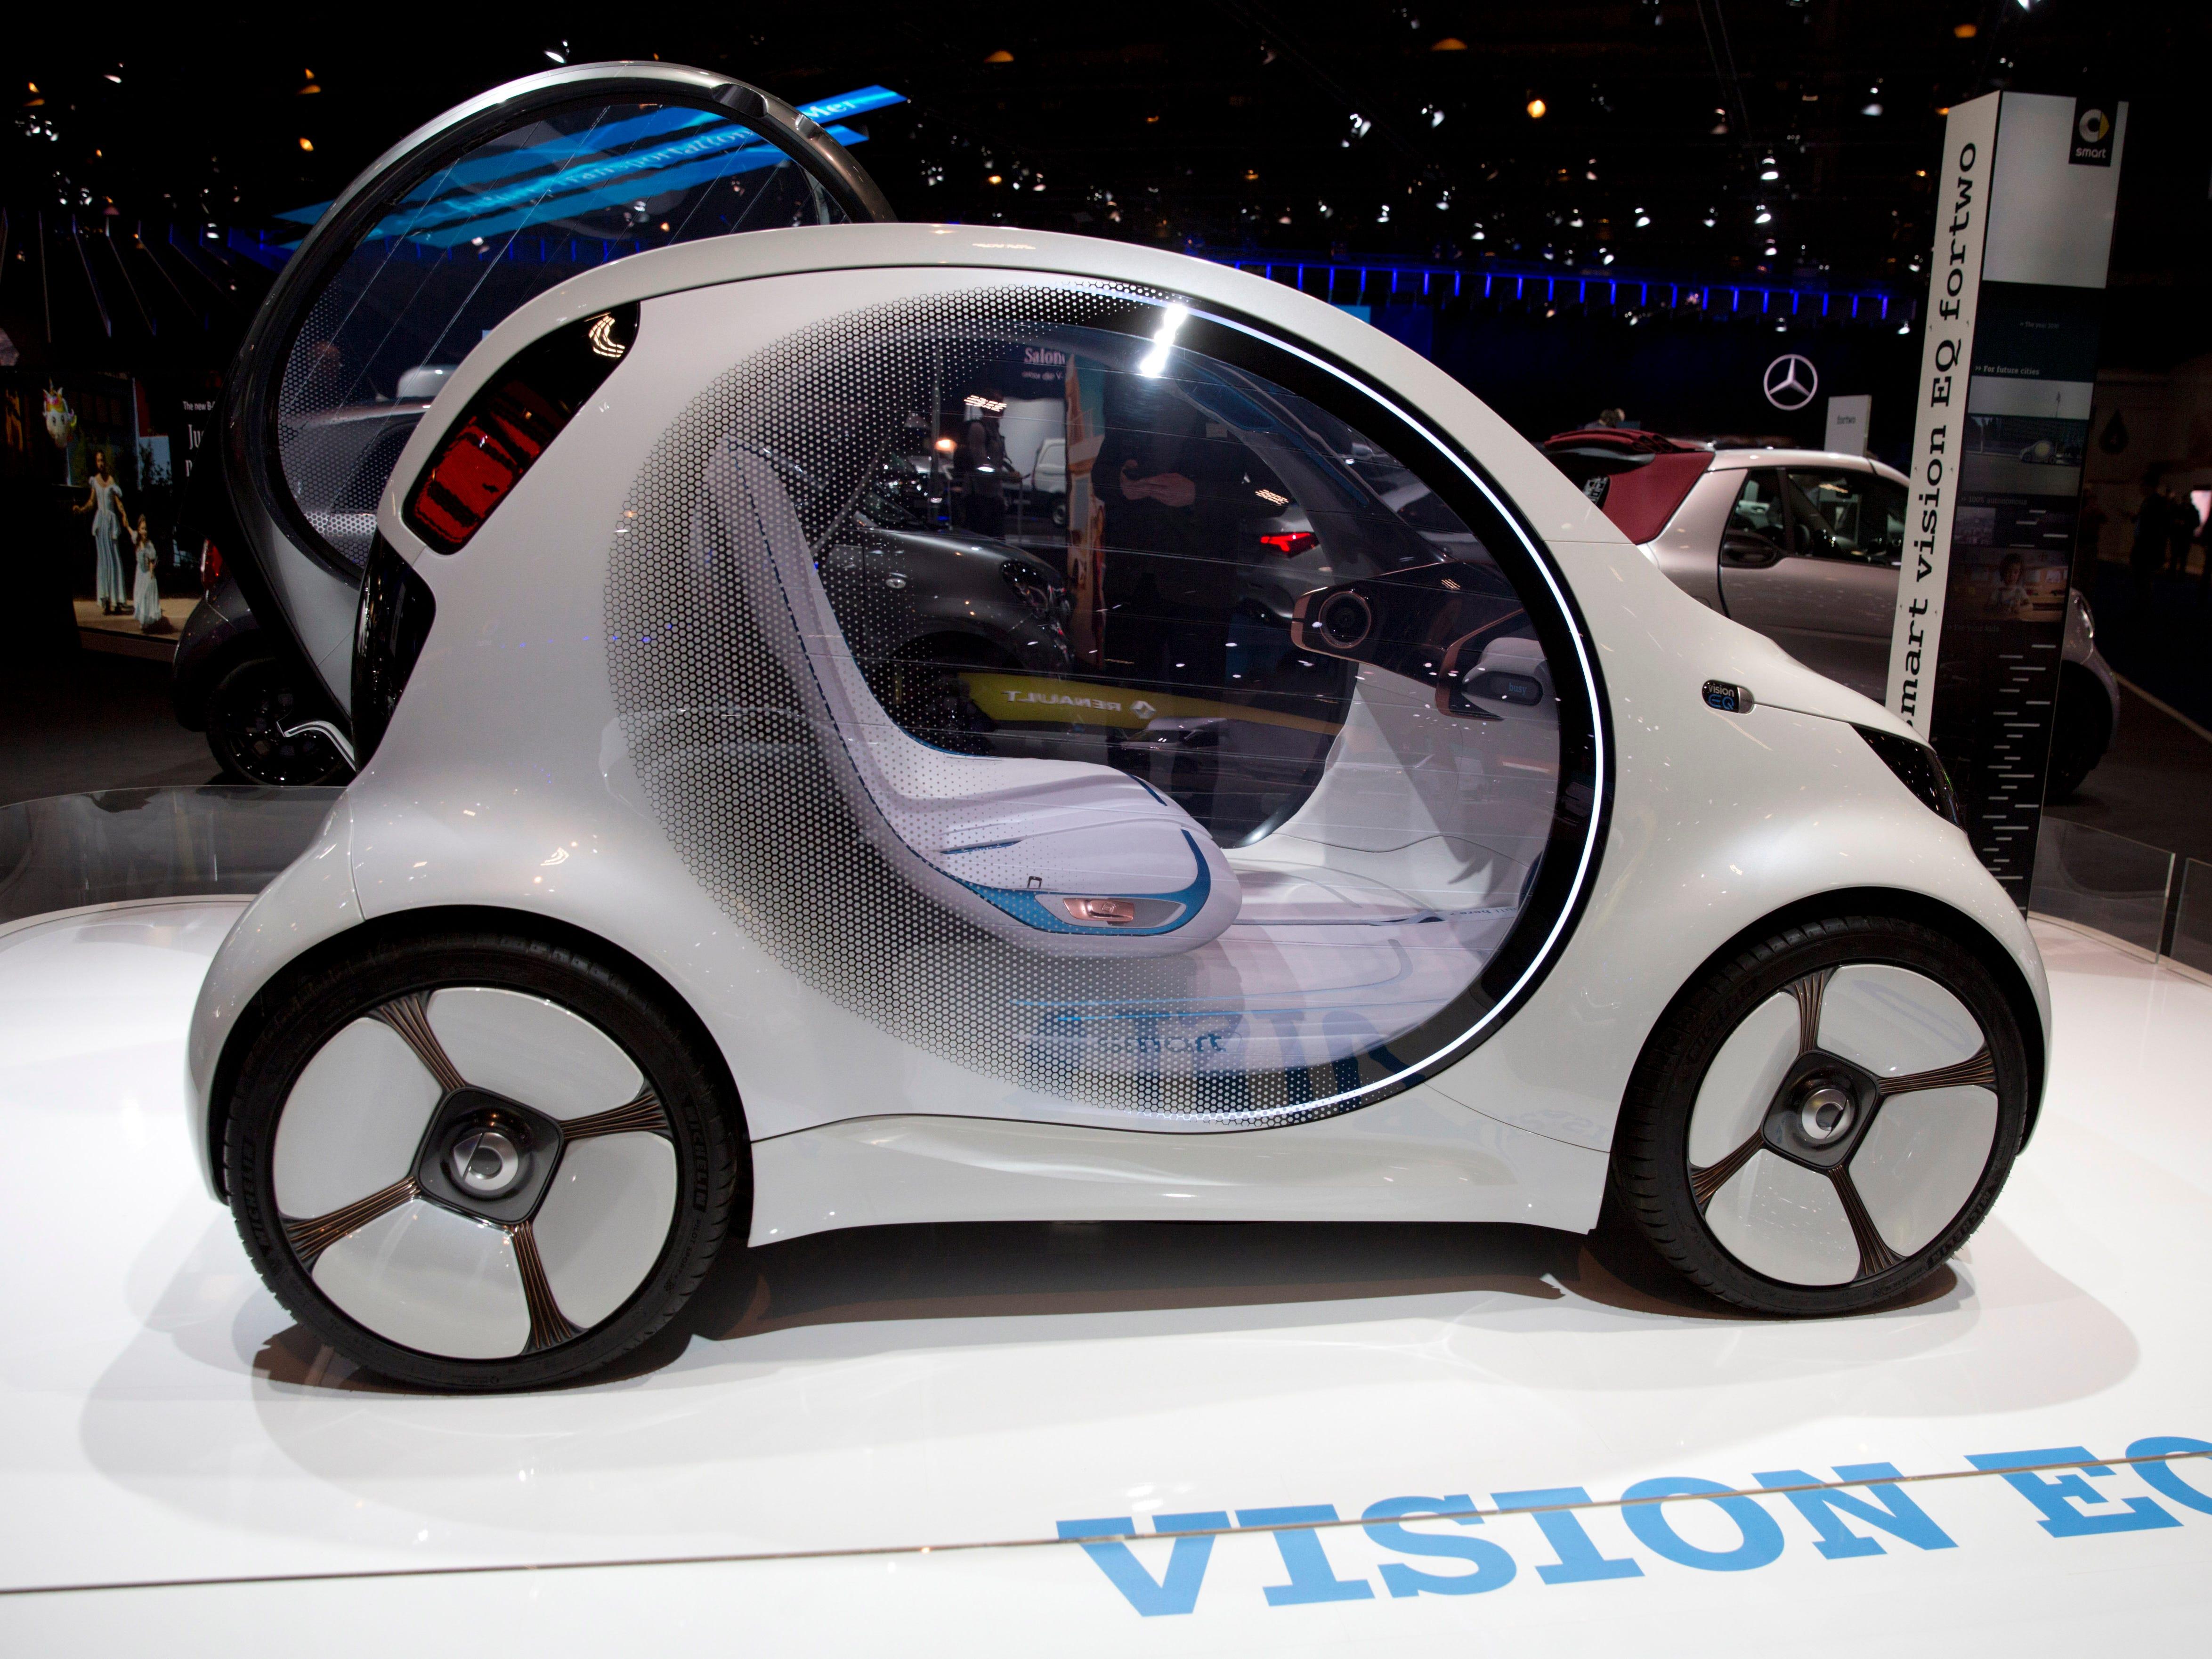 The Smart Vision EQ concept car.